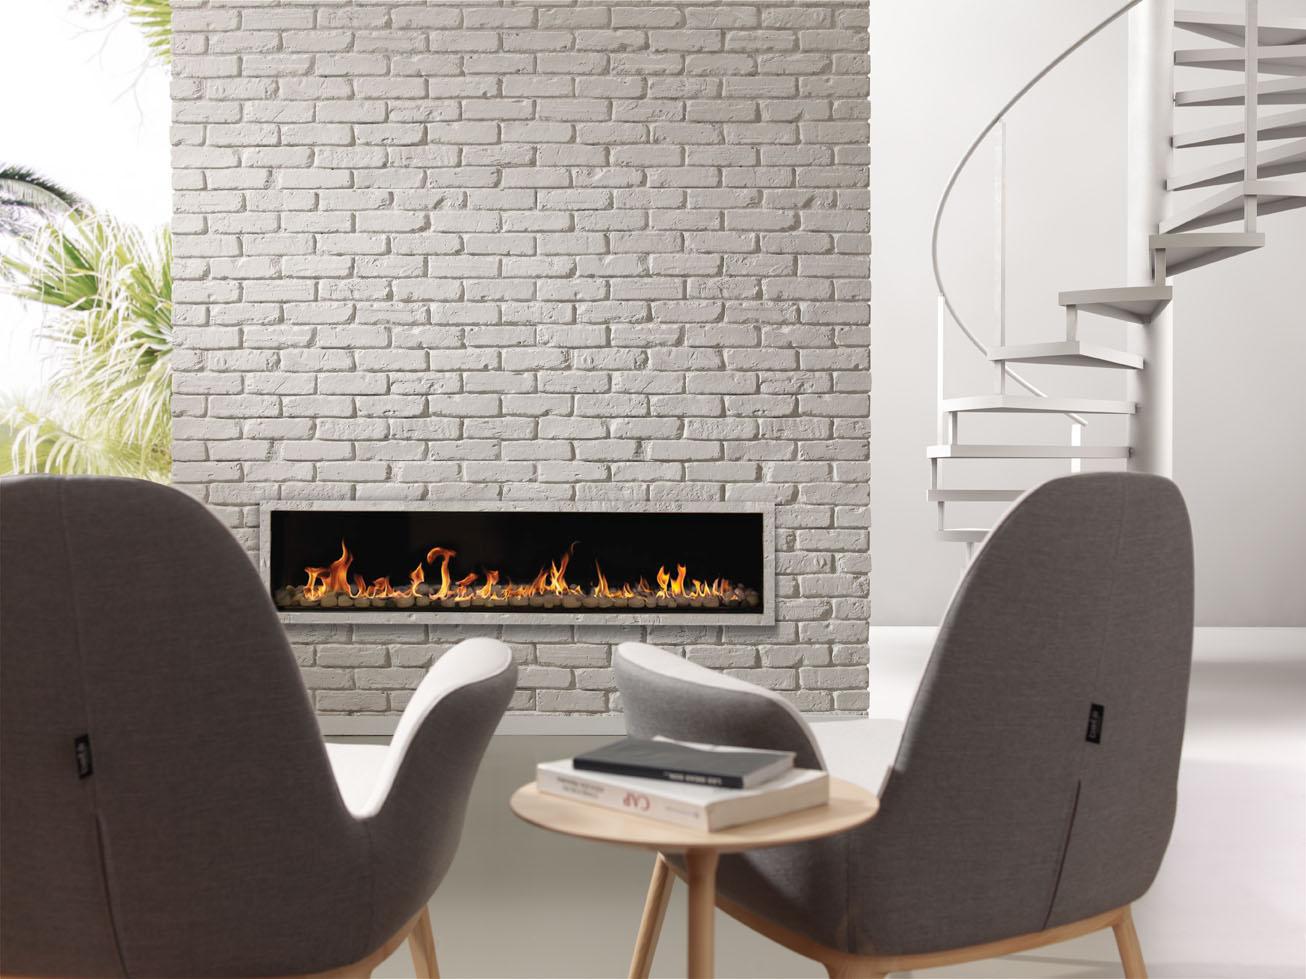 Brick Wallpaper 3d India British Brick Ladrillo Ingles